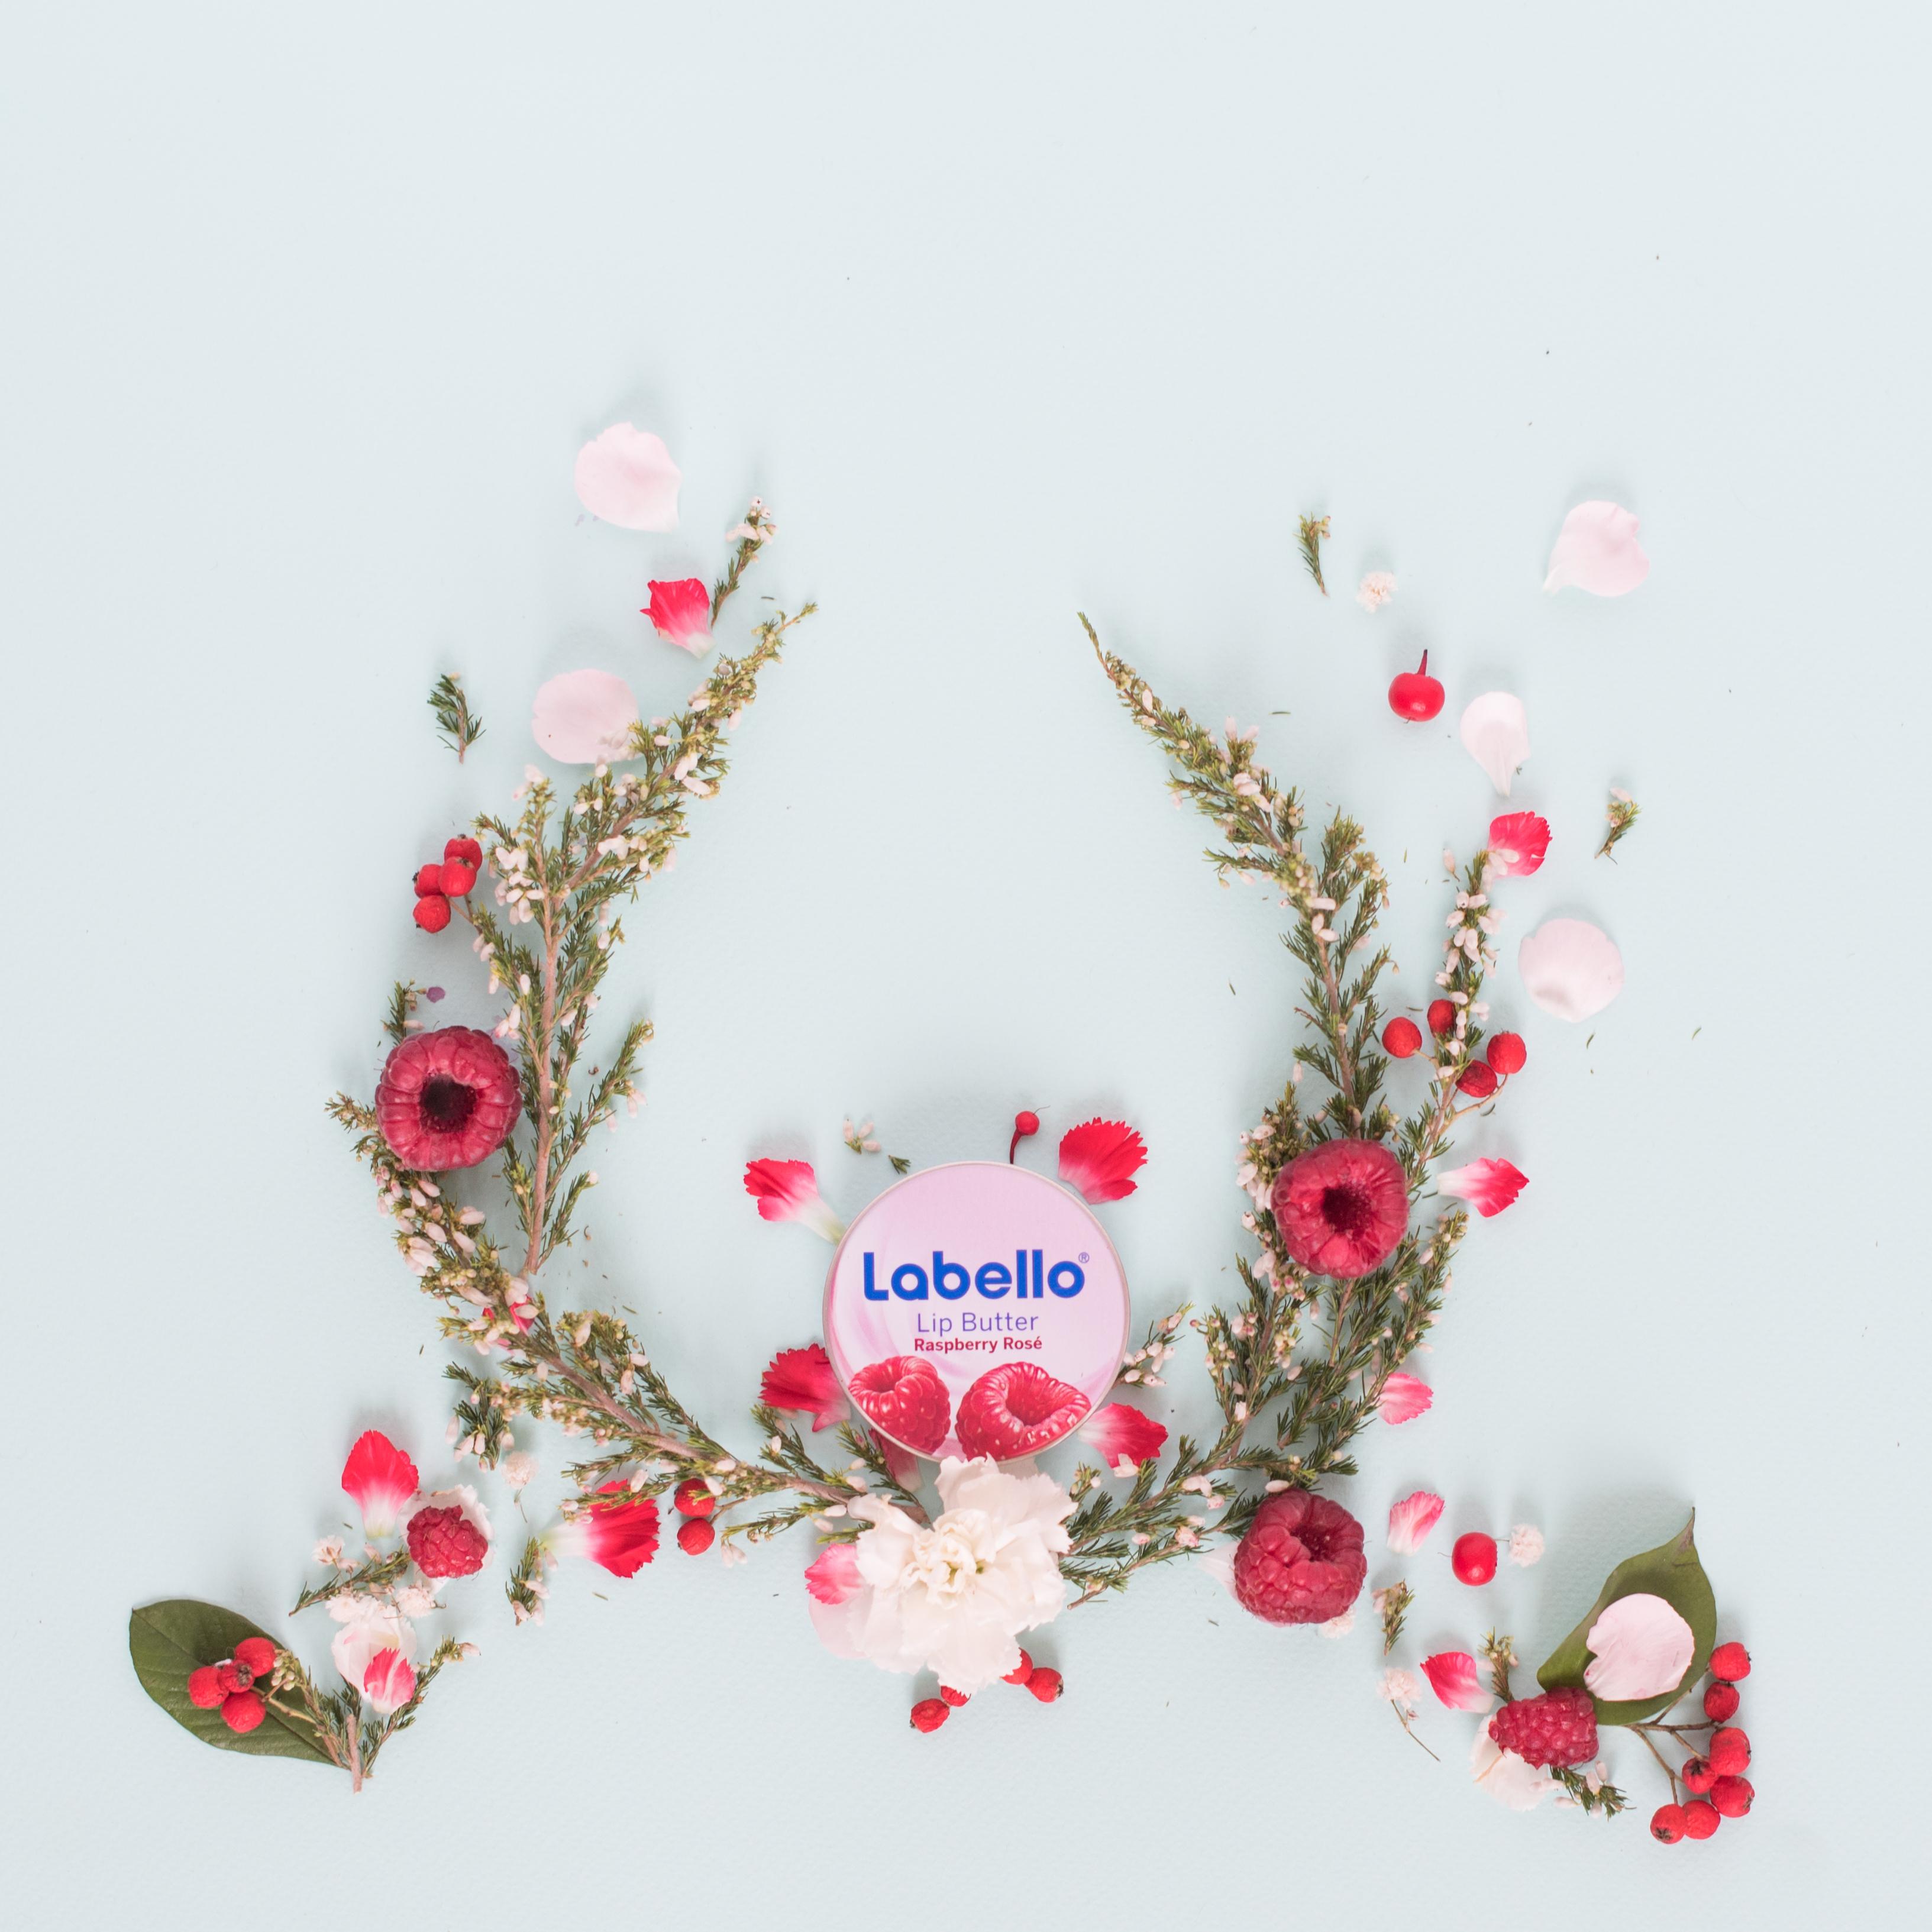 Nymphea's Factory – Labello lip butter-2